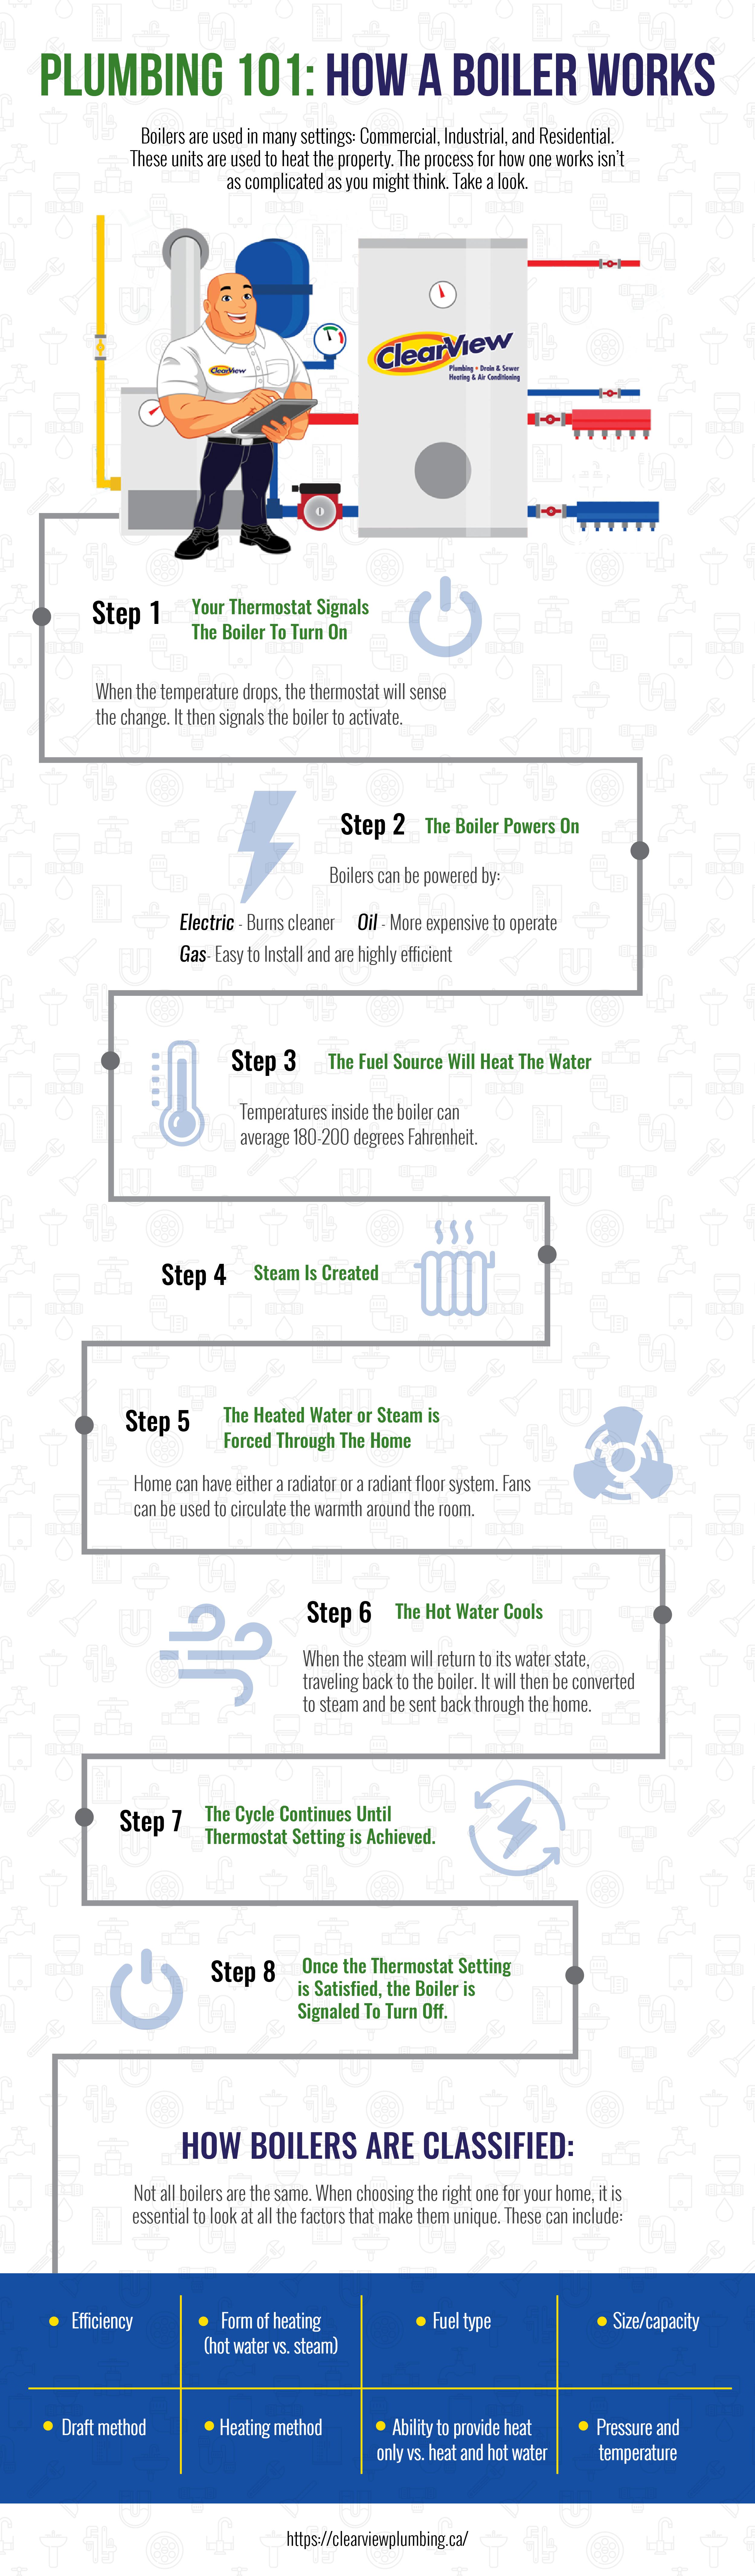 Plumbing 101 : How A Boiler Works